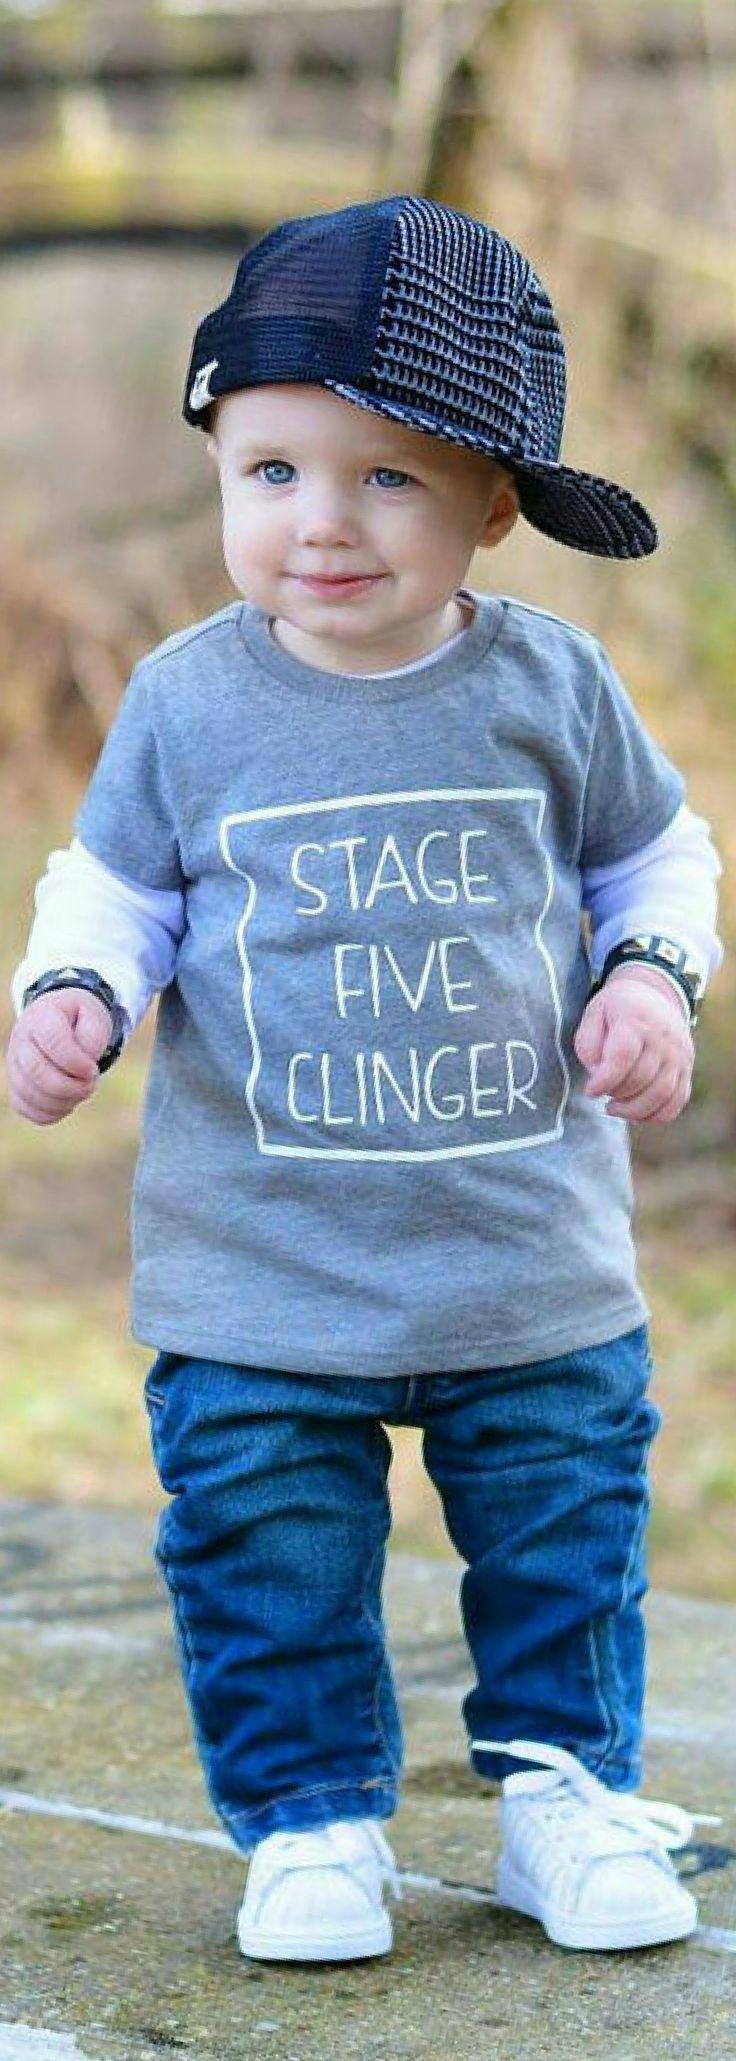 165 best Kids Fashion images on Pinterest | Babies clothes, Babies ...